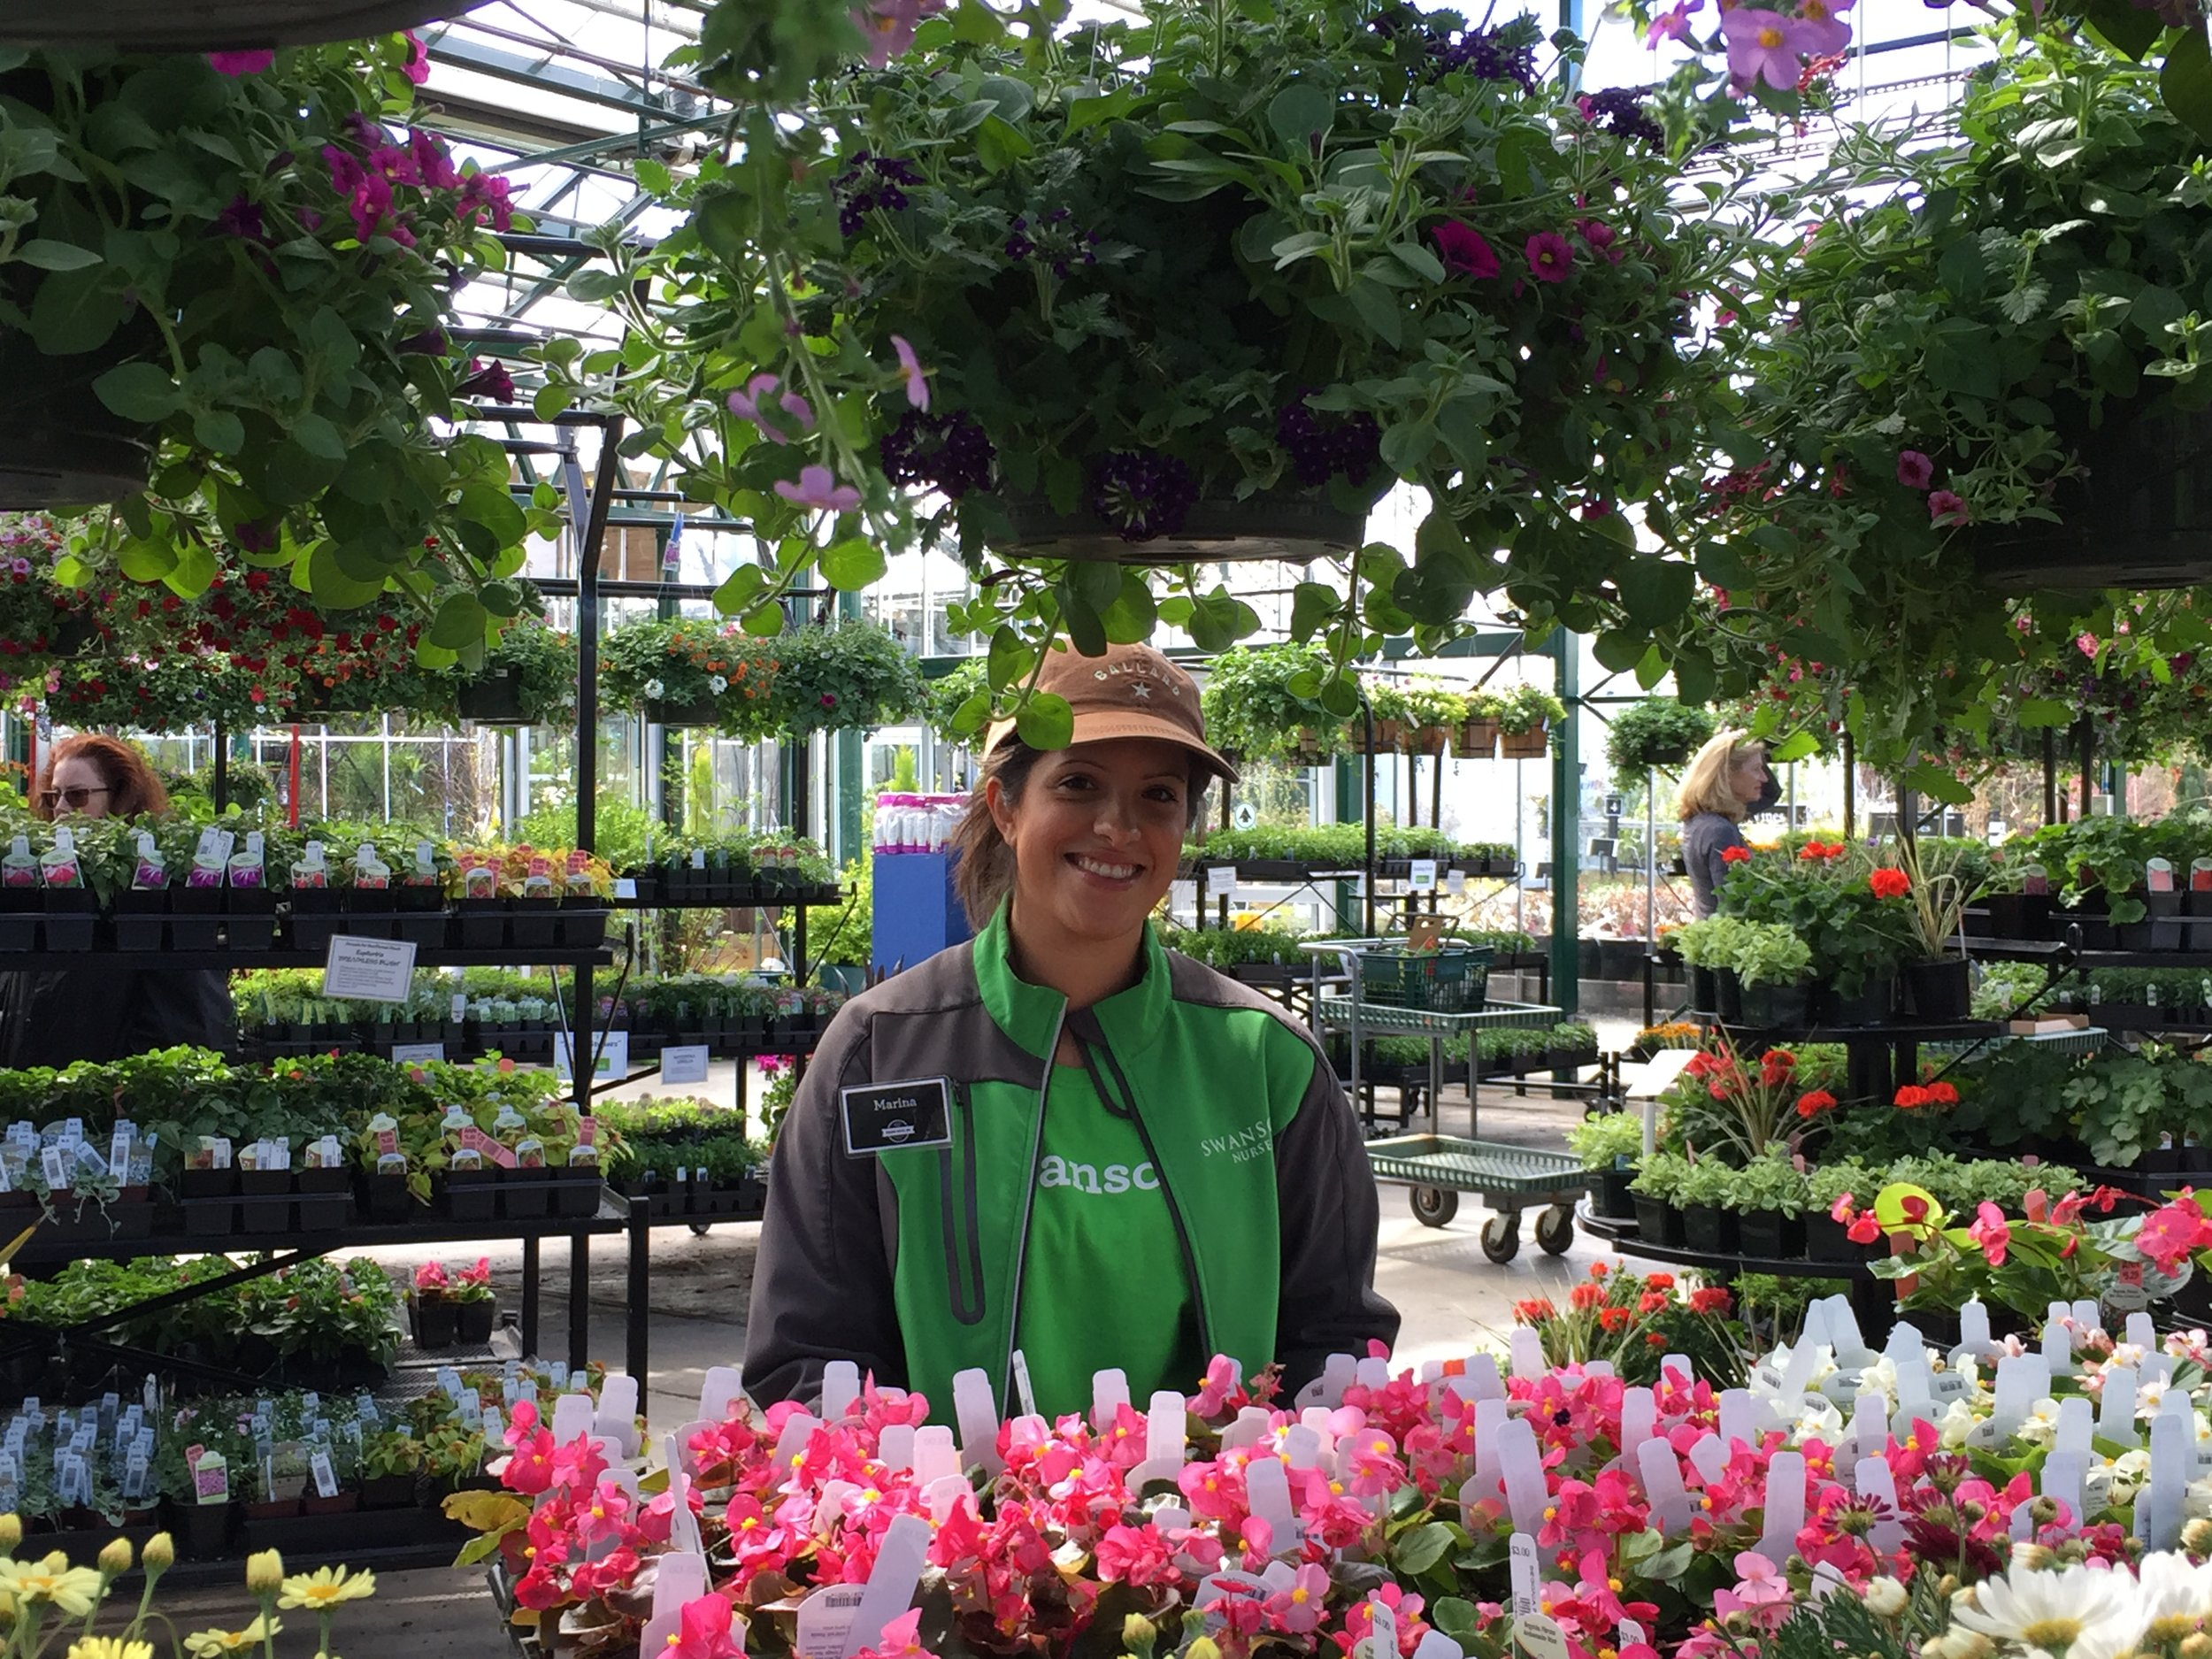 Marina finishing an annual flower display